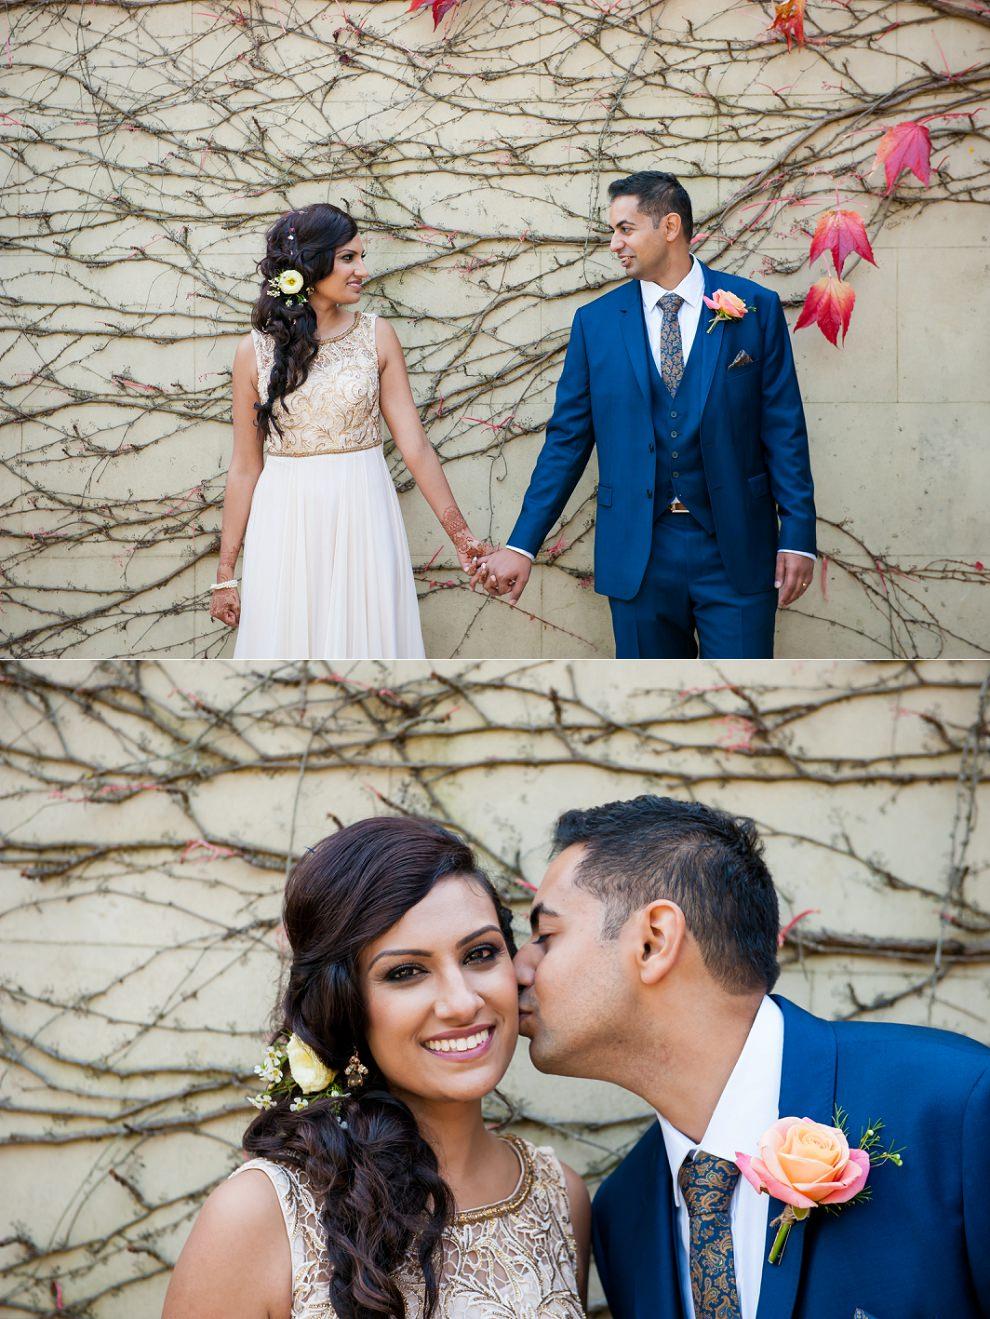 Best-wedding-photos-UK-2015-133